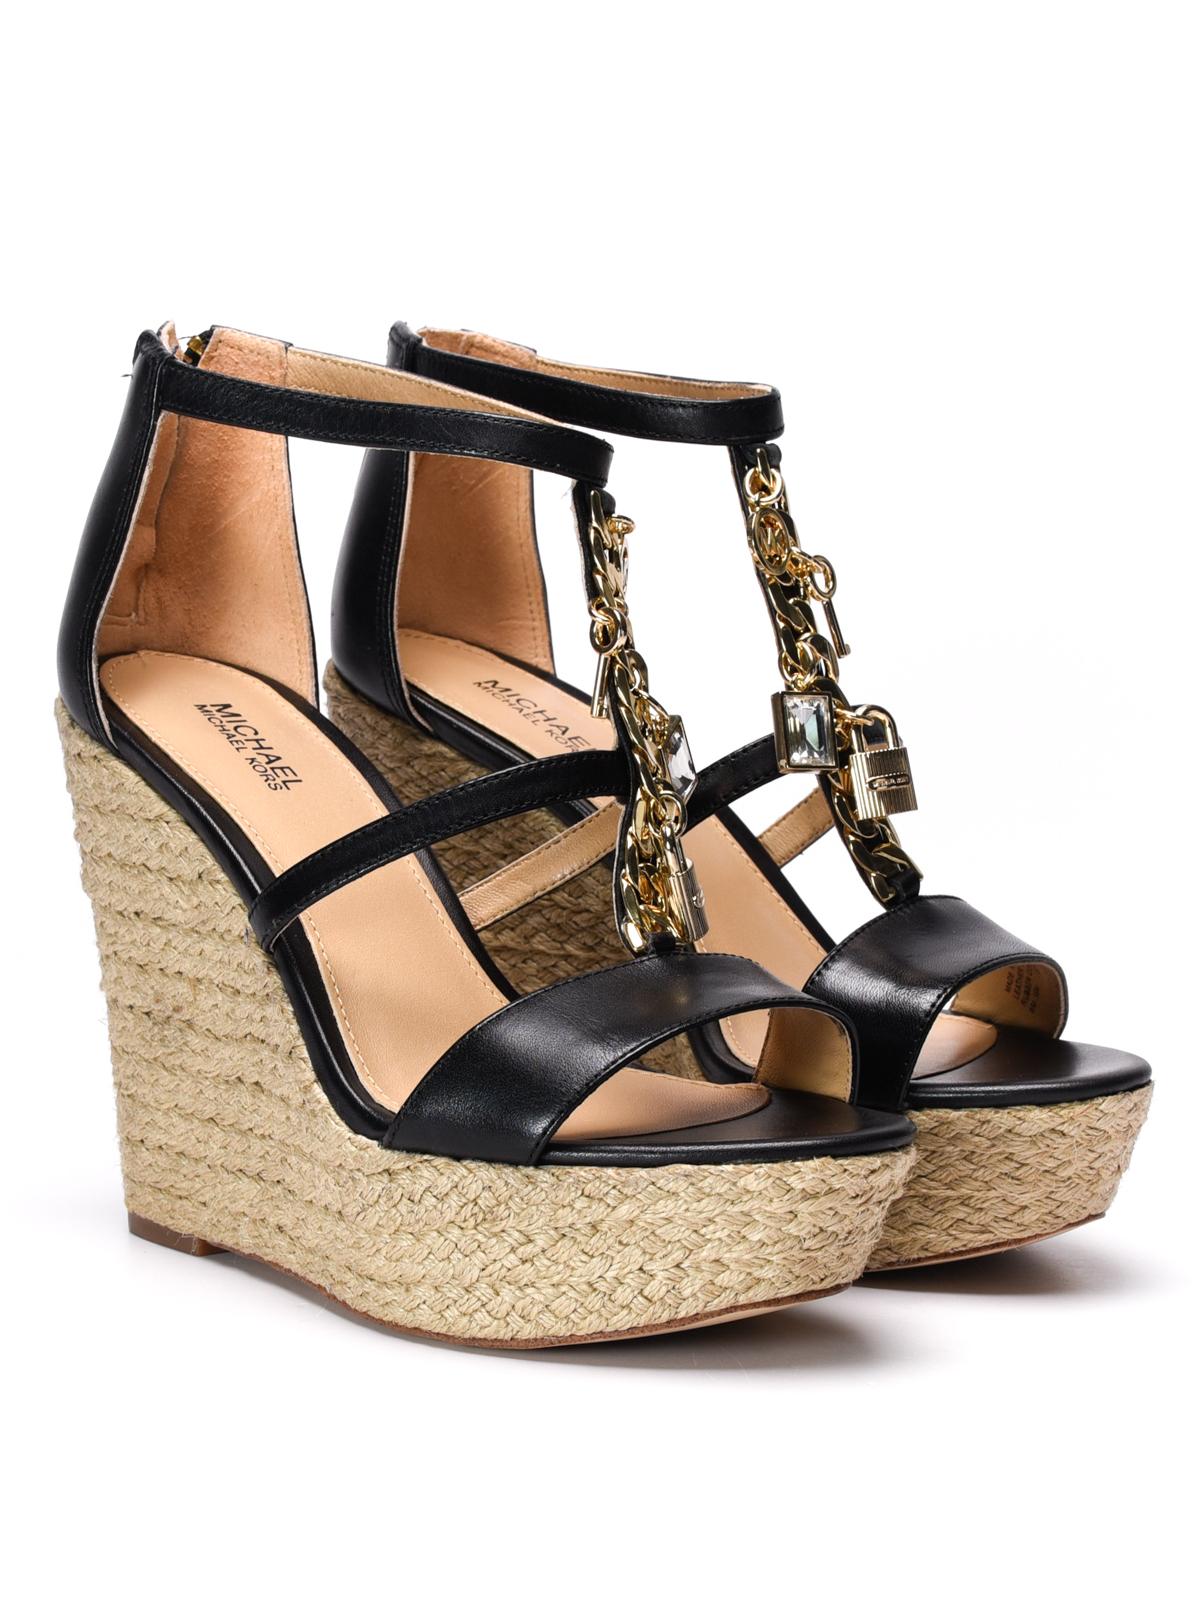 40d09f9bb5e0f Michael Kors - Suki wedge leather sandals - sandals - 40R7SKHA1L 001